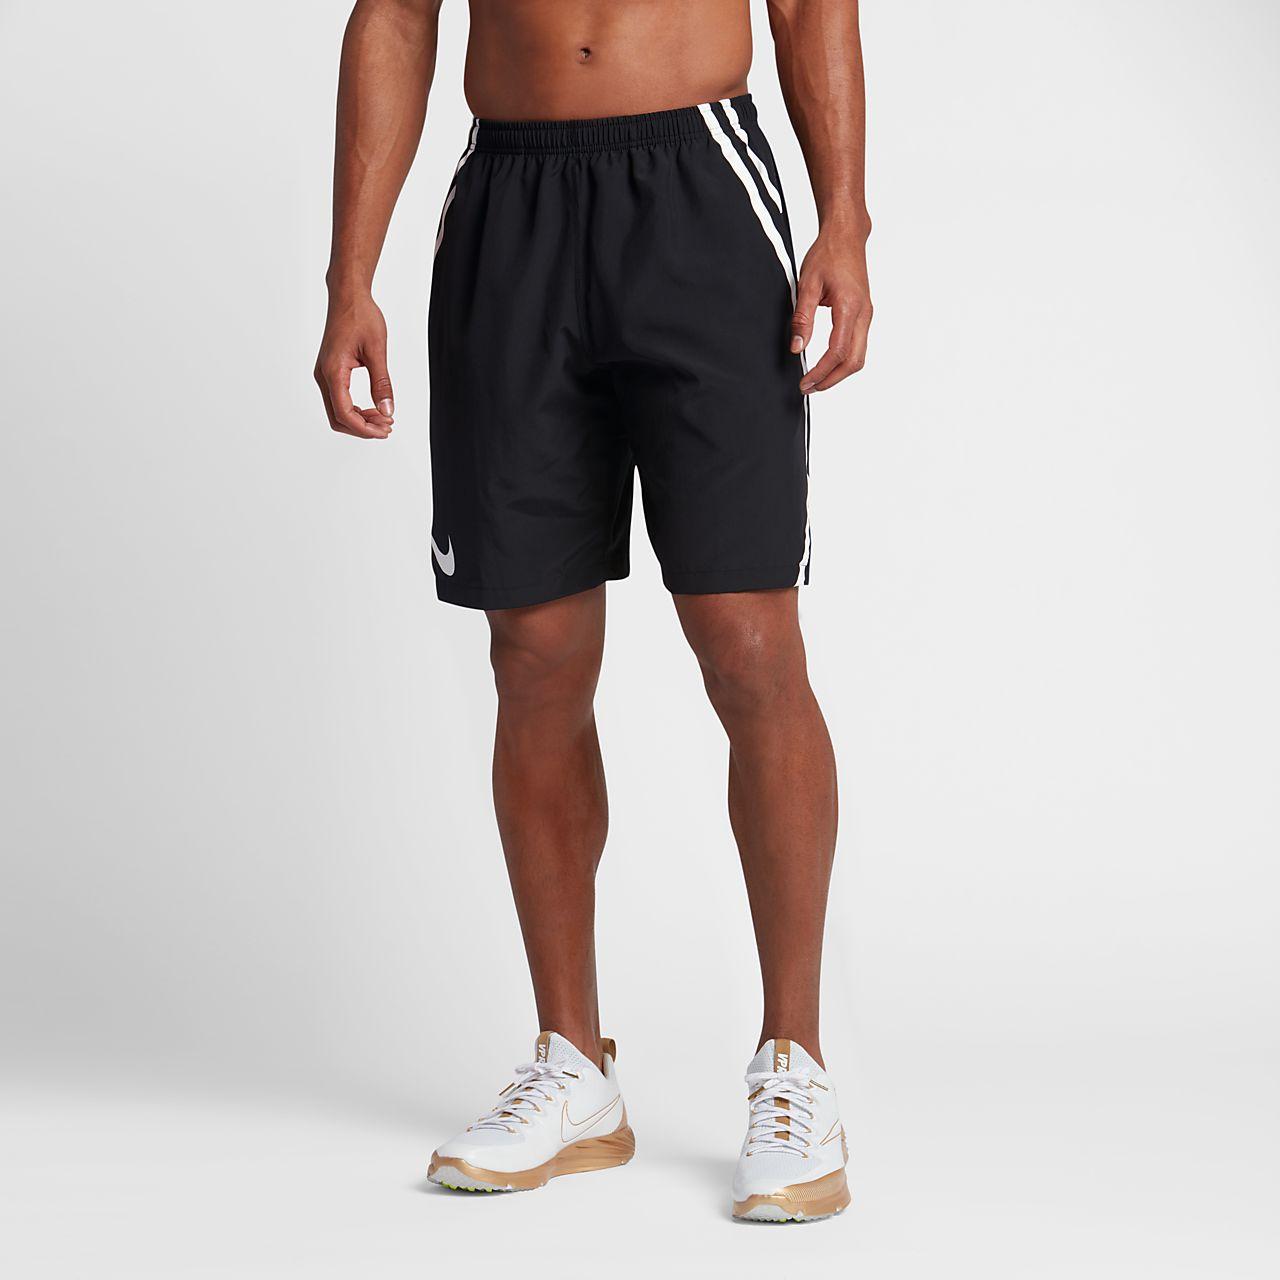 ... Nike Dri-FIT Untouchable Woven Men's Football Shorts